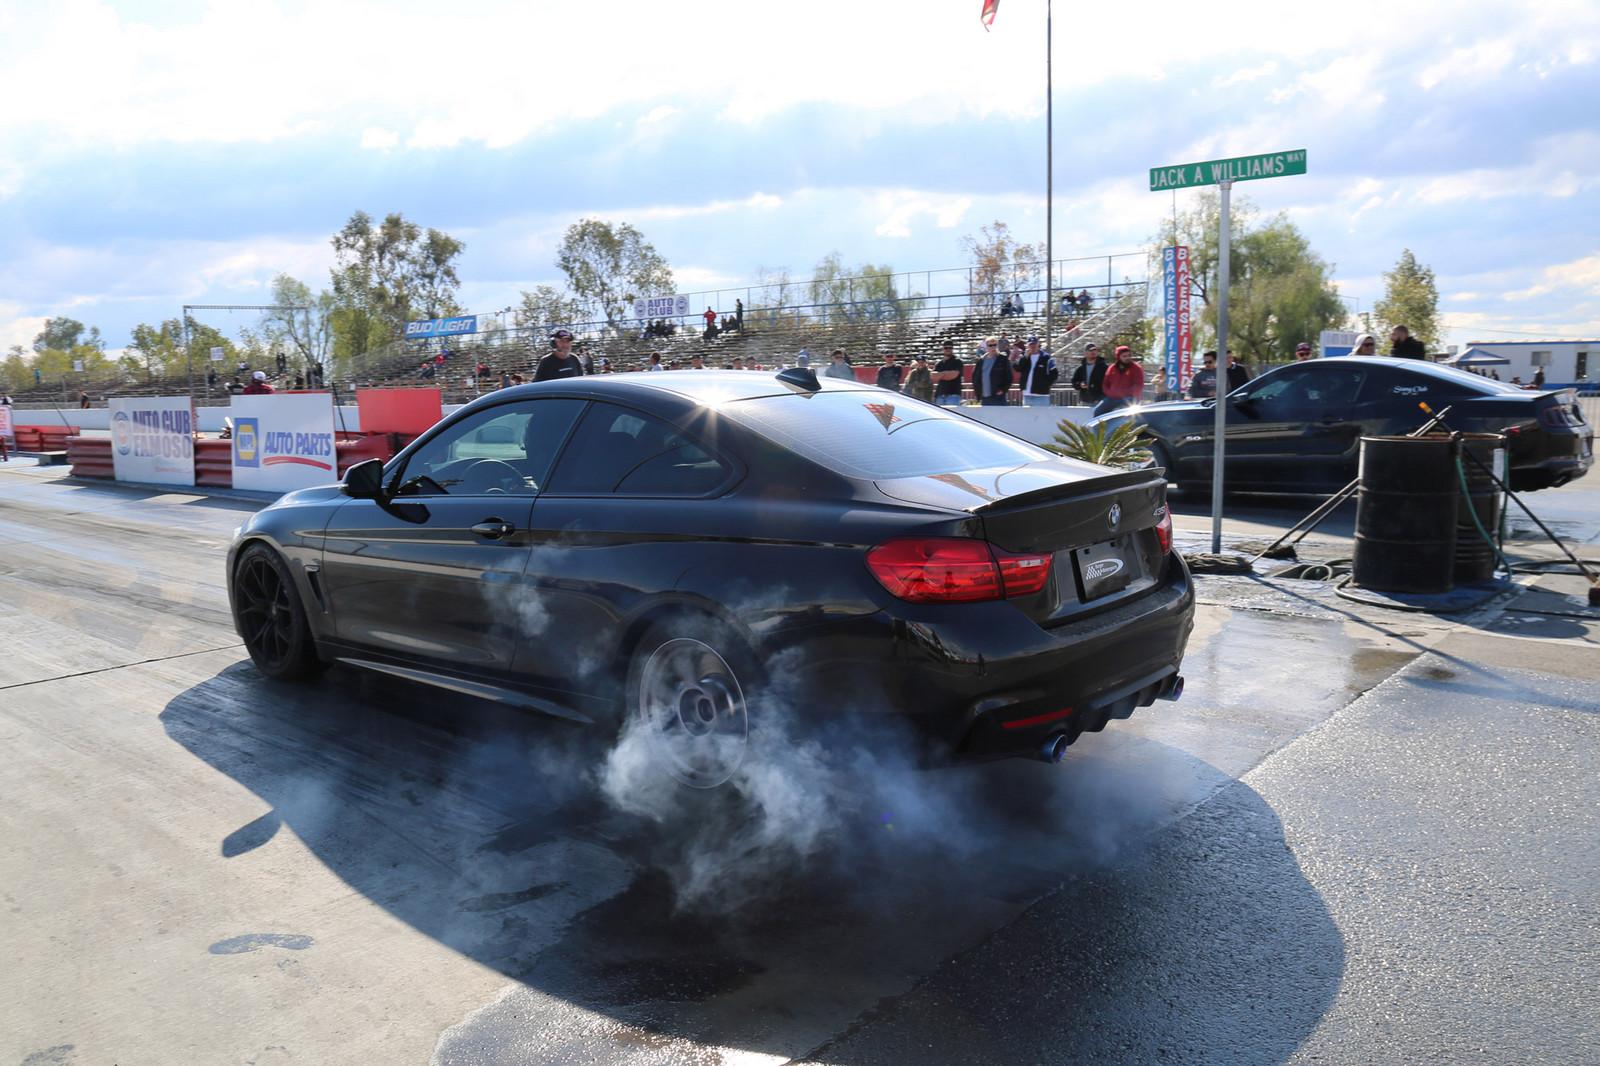 2014 bmw 435i 1/4 mile drag racing timeslip specs 0-60 - dragtimes